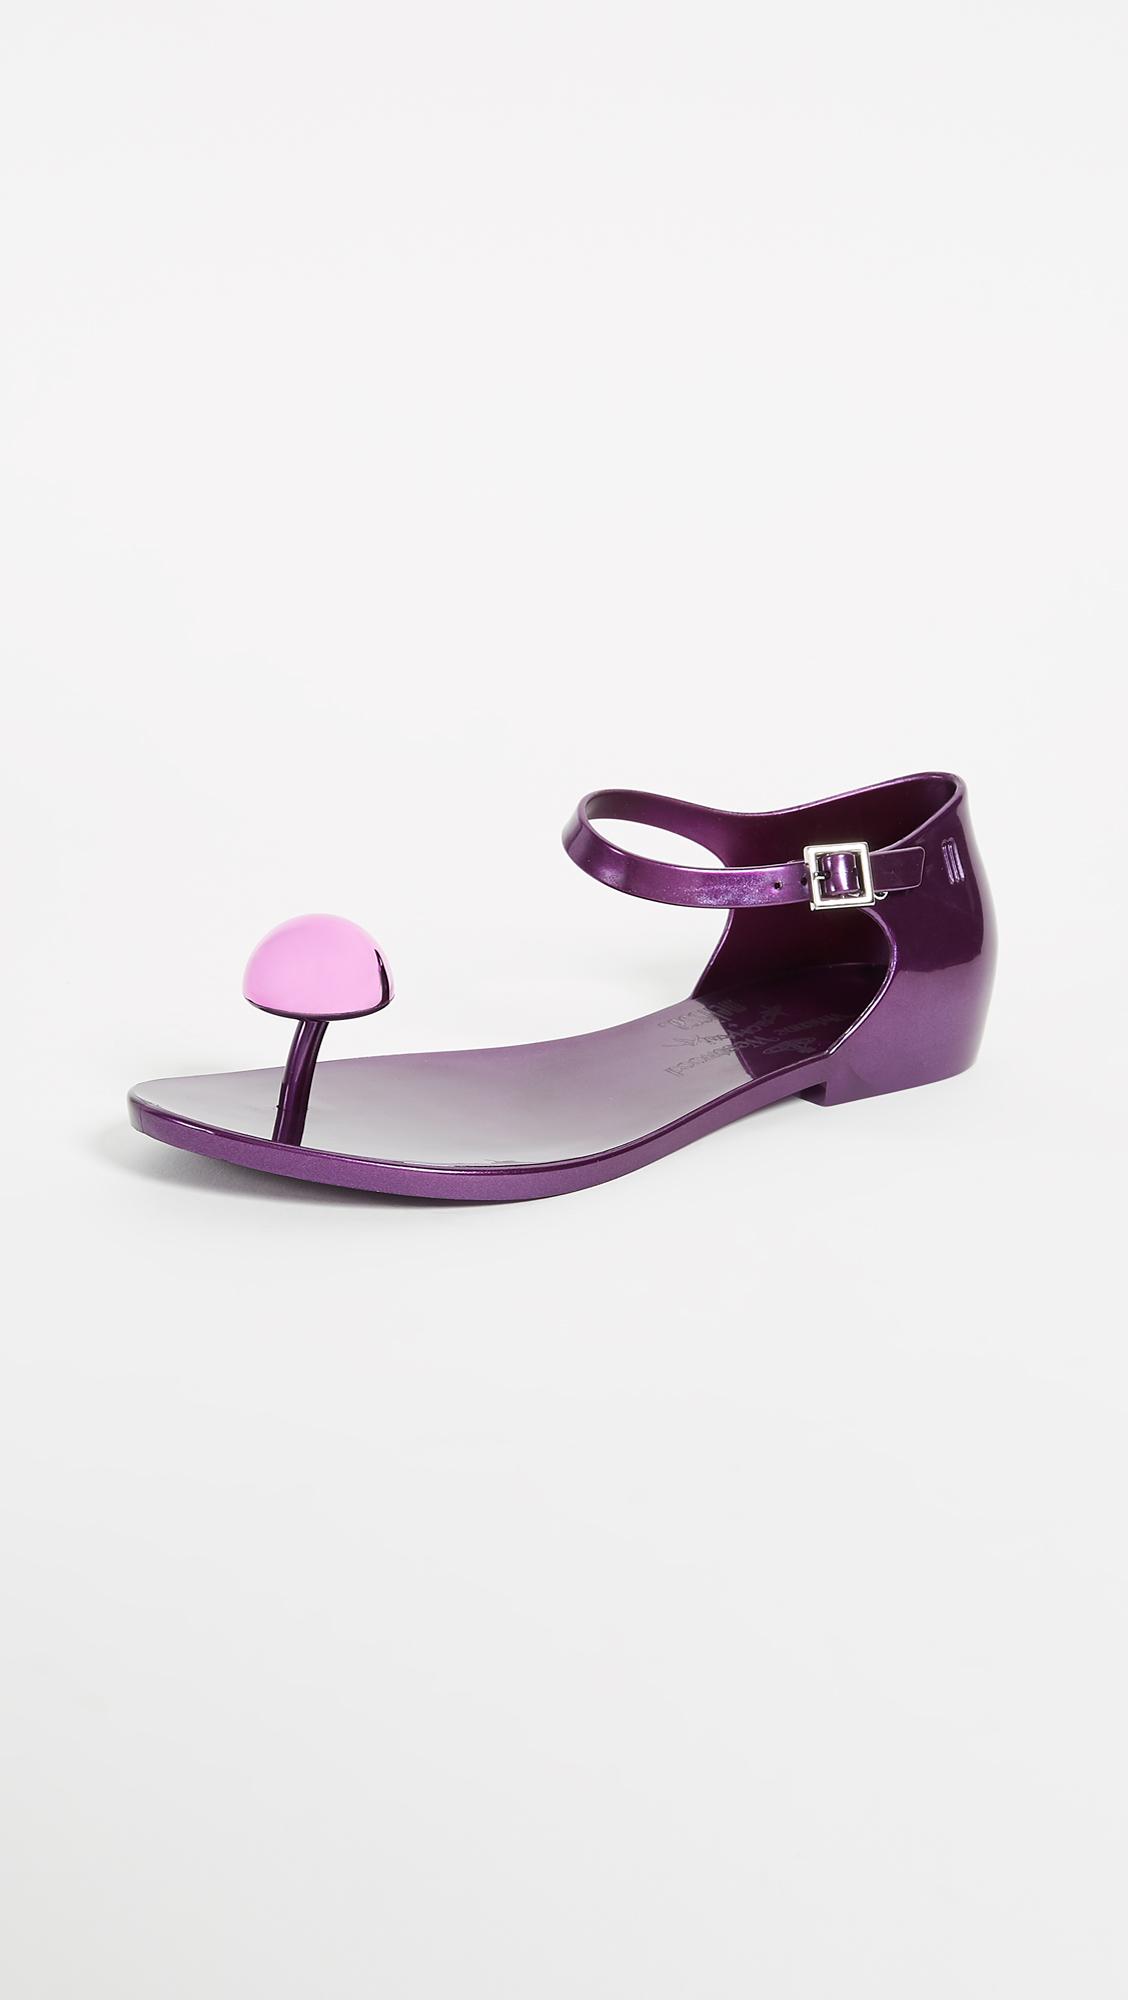 mel by melissa shoes malaysia sandals barbados tripadvisor 83108